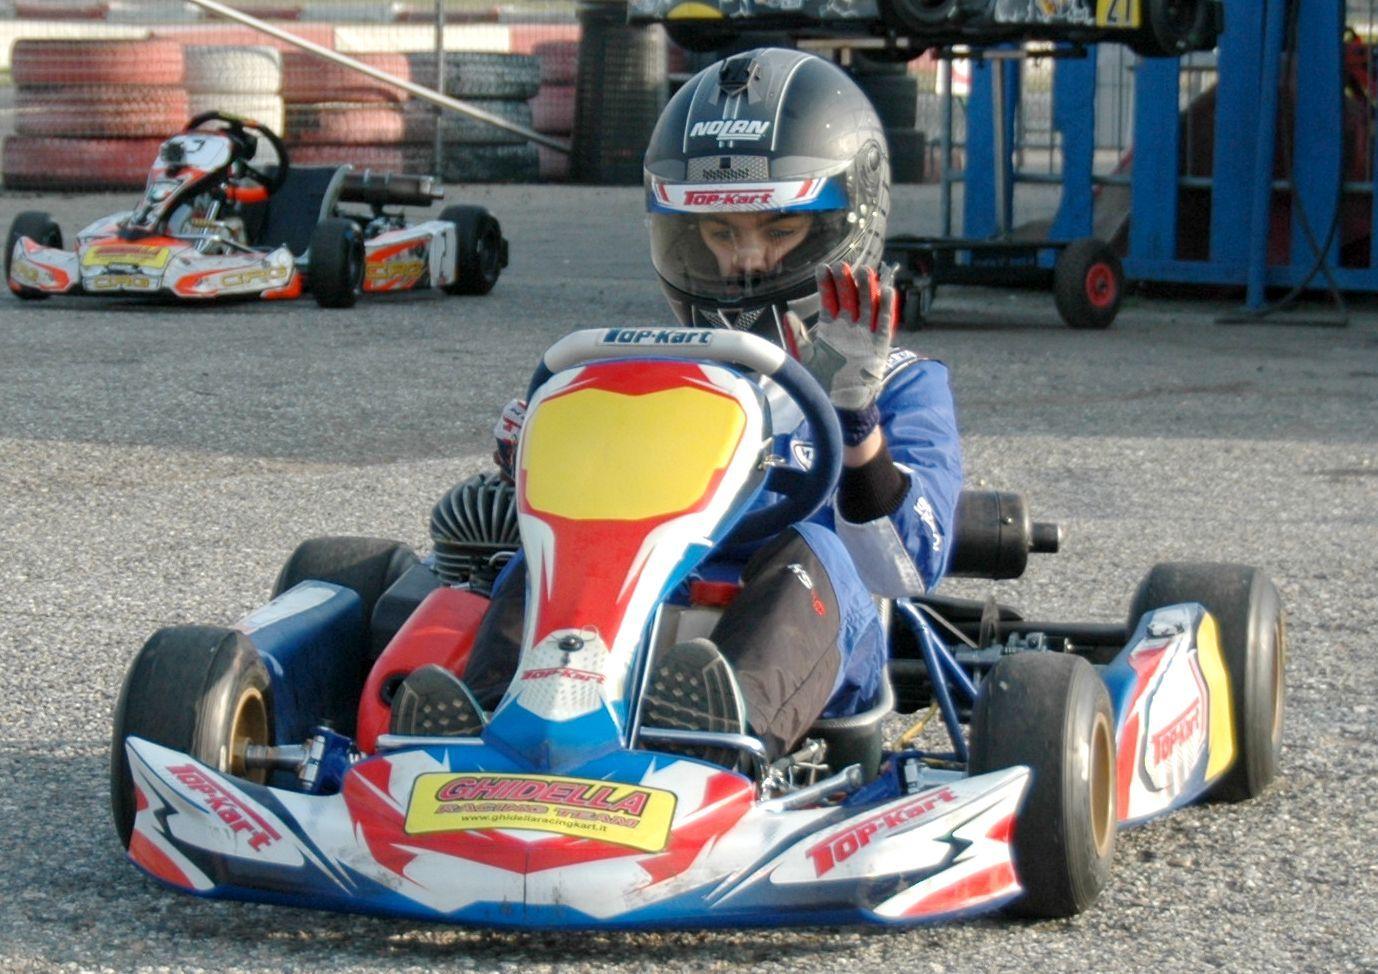 Pin de maxfc_official Maxime Furon em Racing Kart Kart